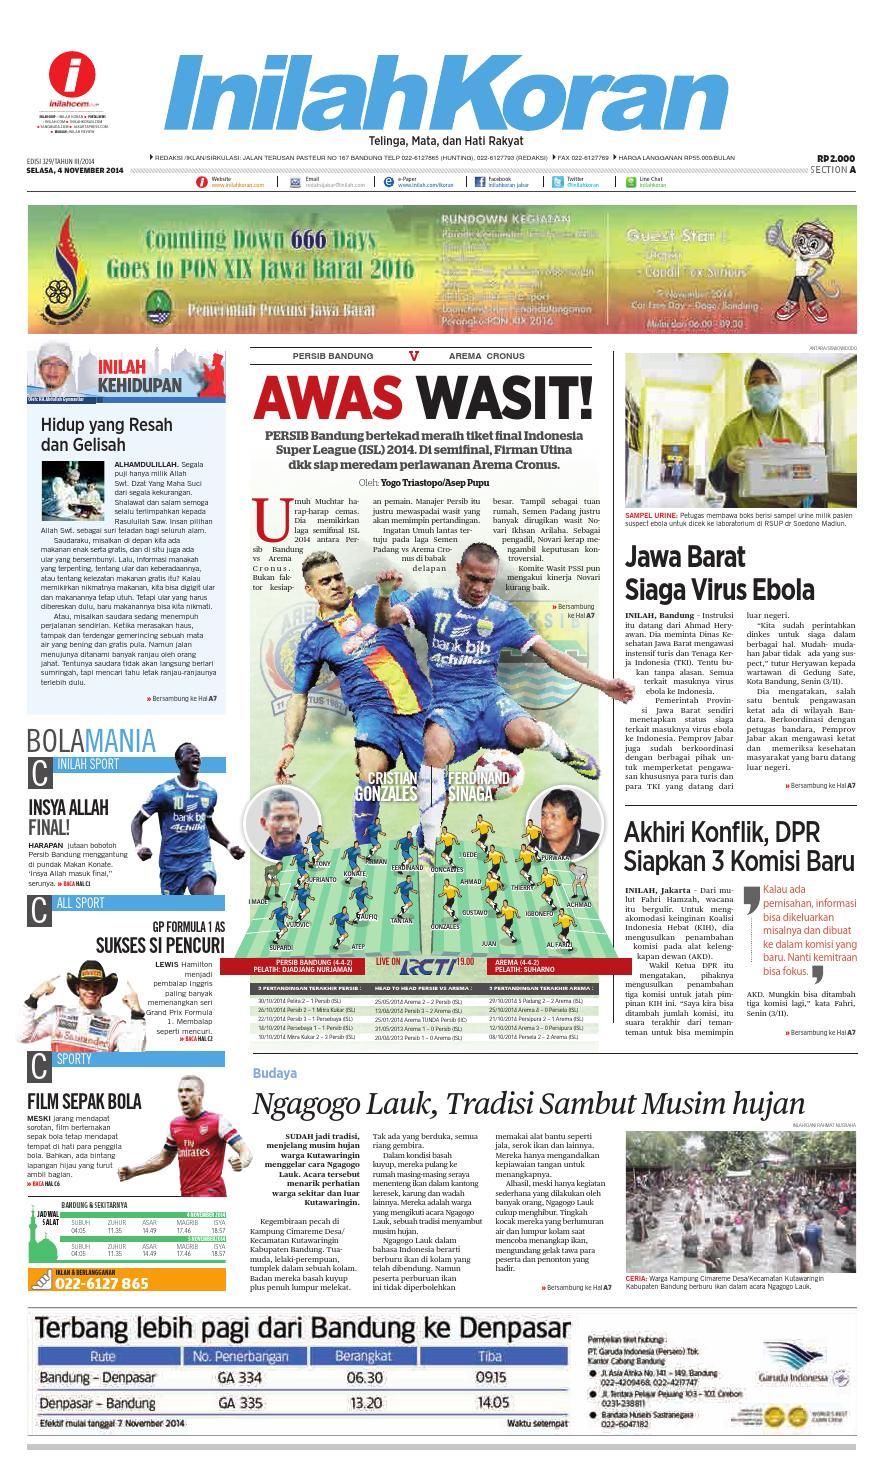 AWAS WASIT! by Inilah Media Jabar - issuu 5ad7b7fd0b